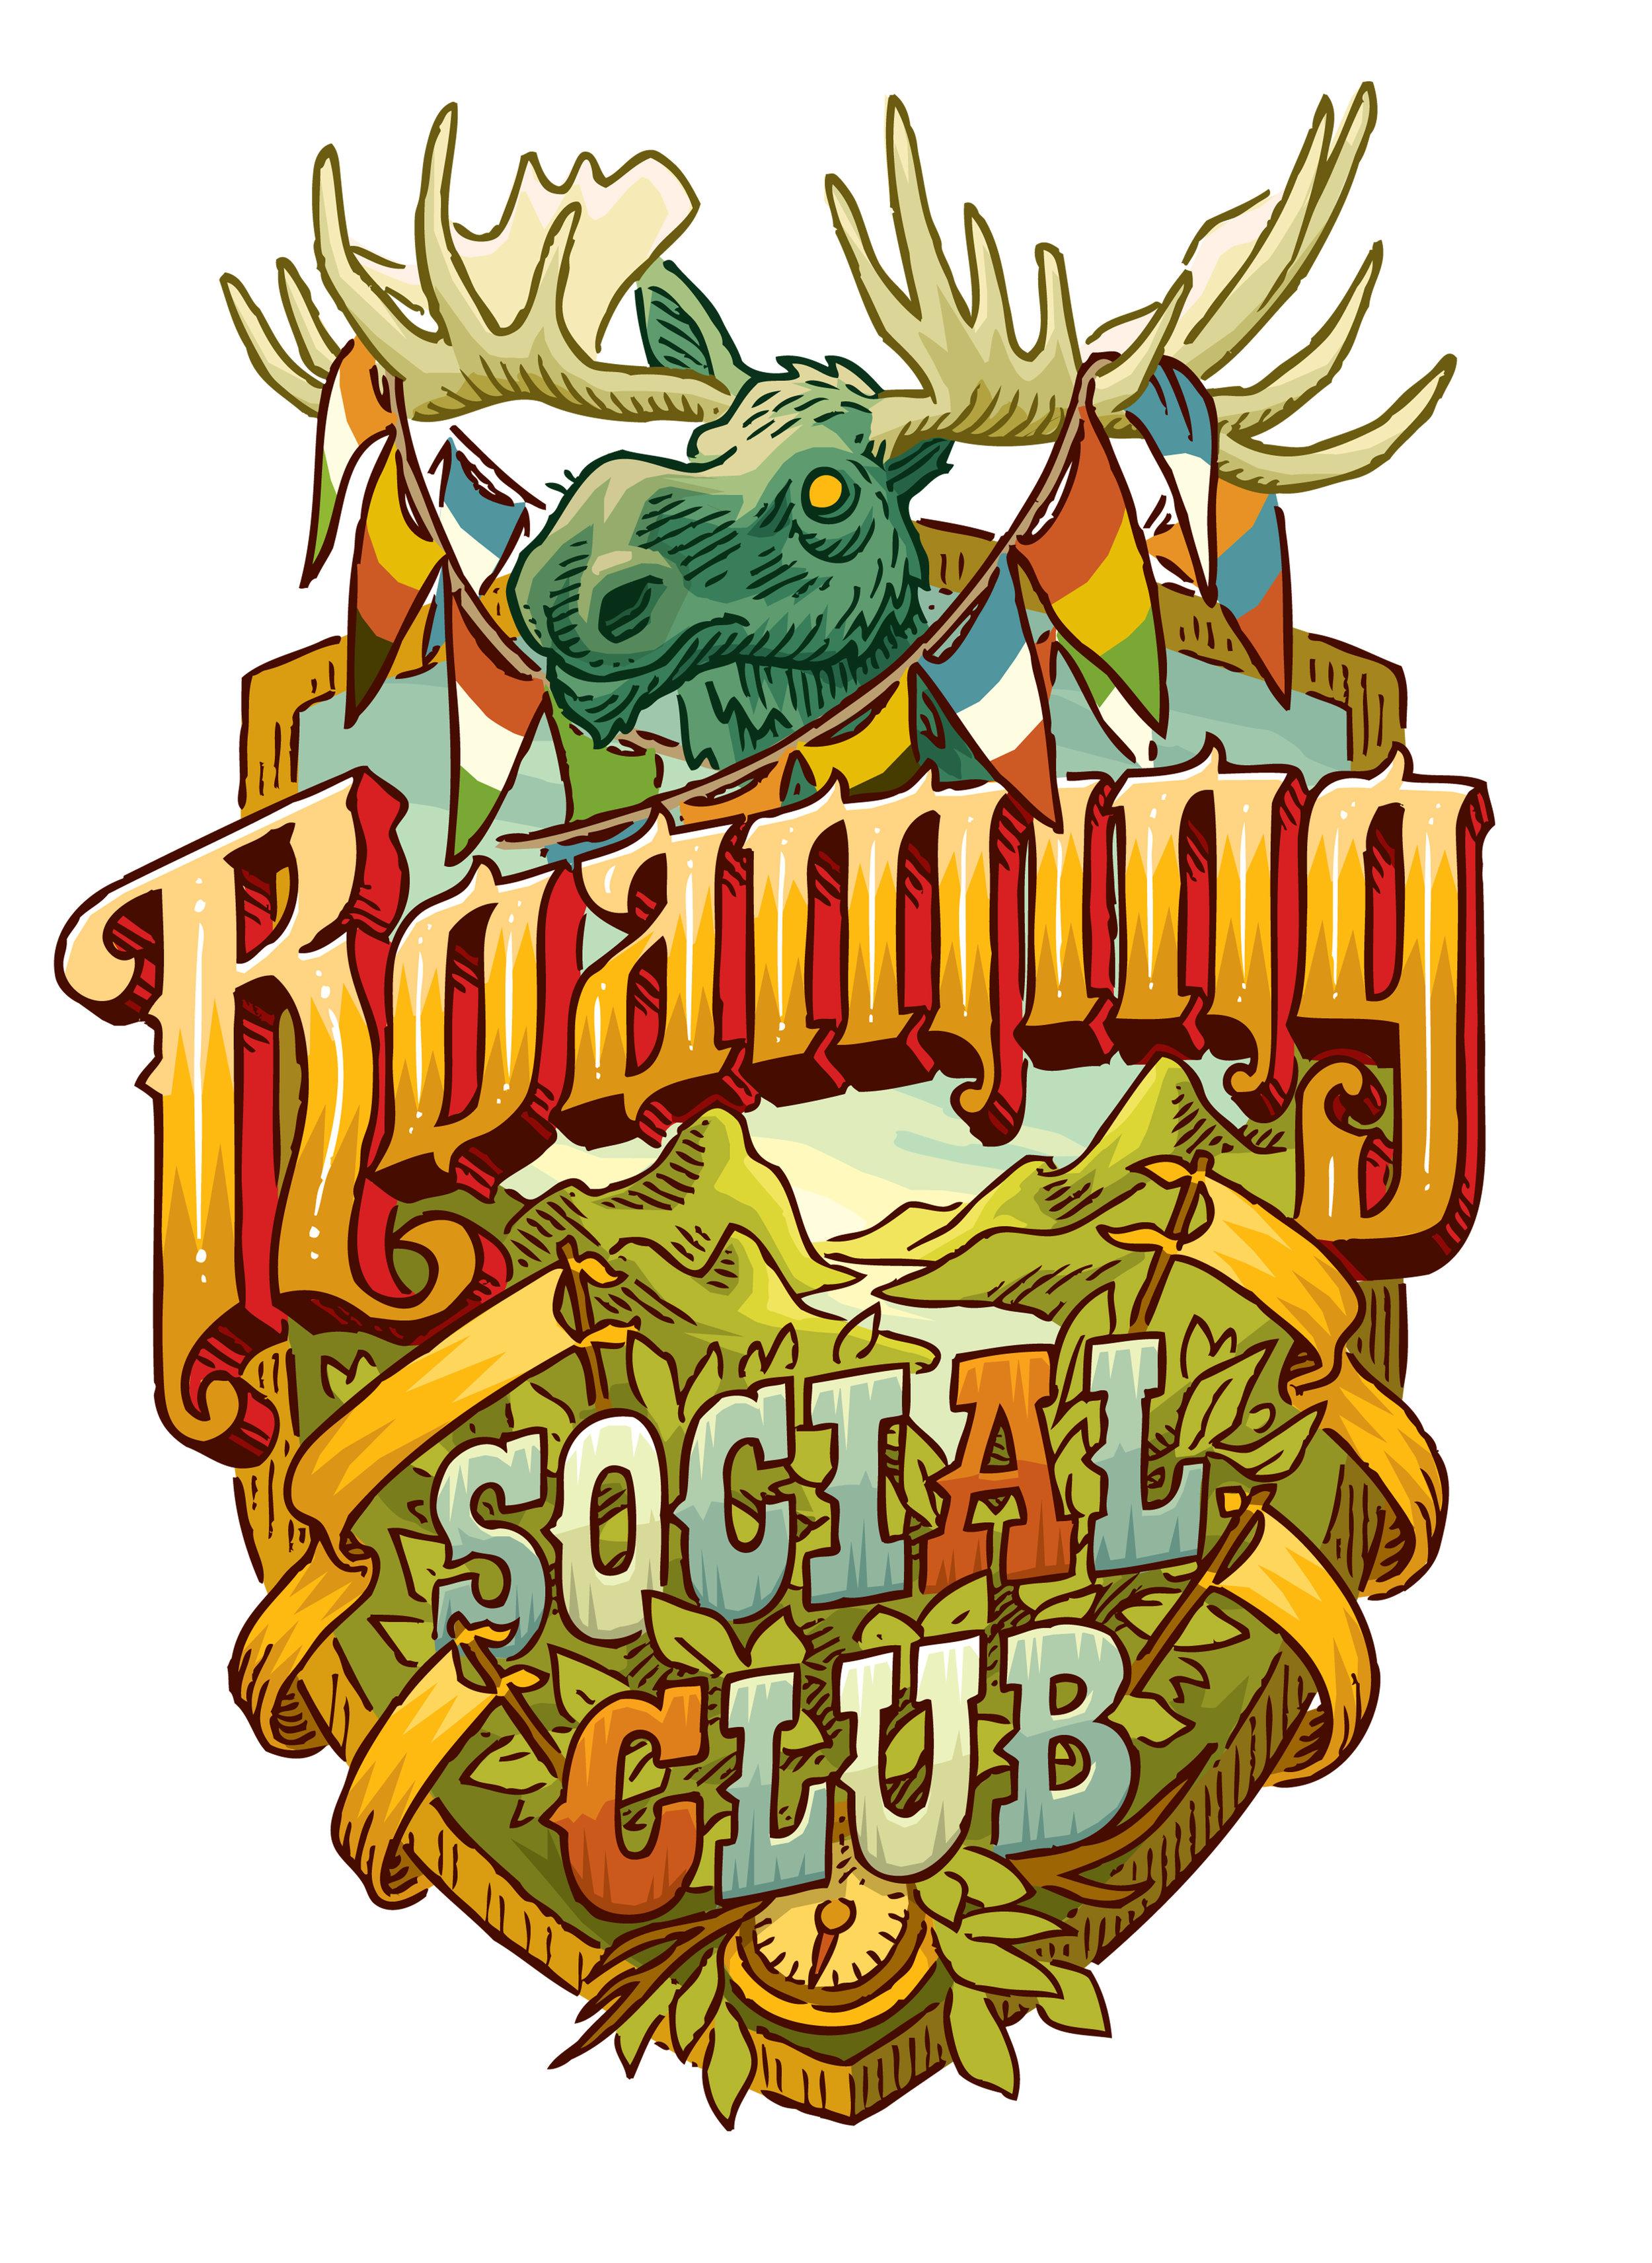 roaming social club logo.jpg